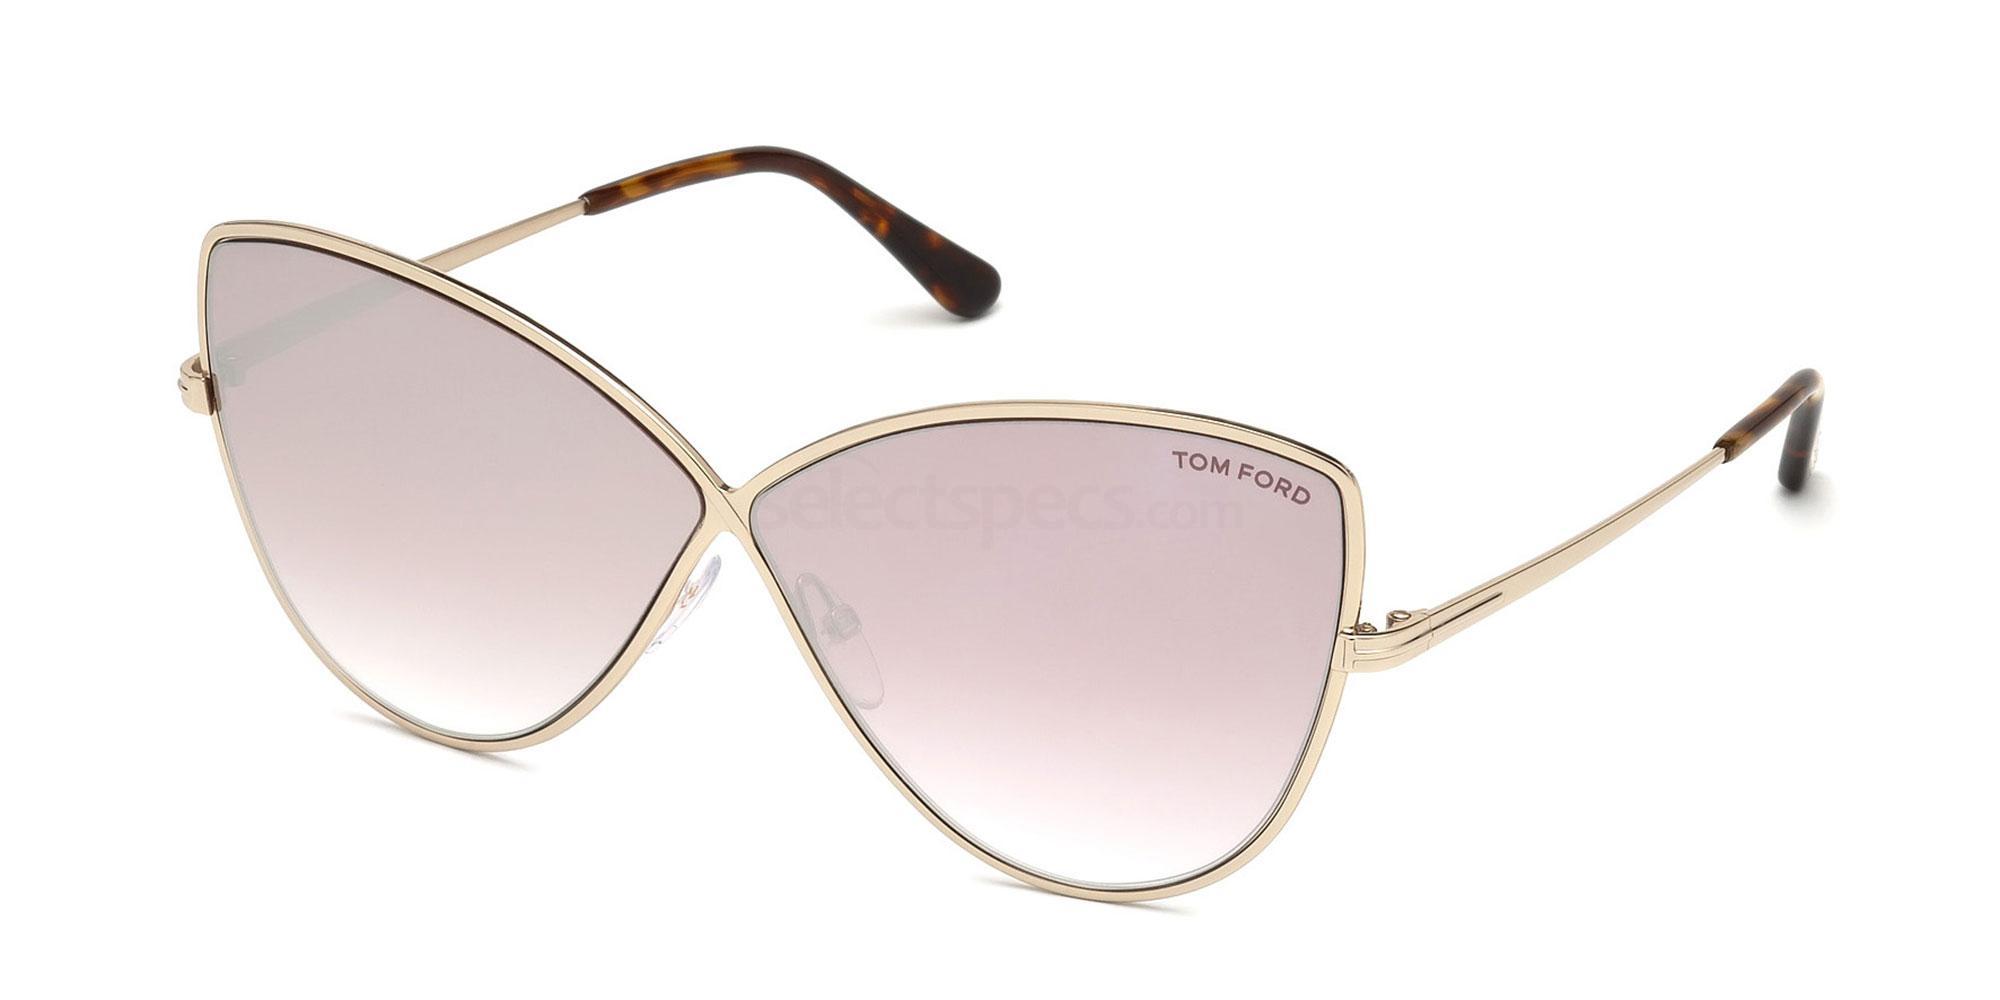 Tom Ford FT0569 sunglasses